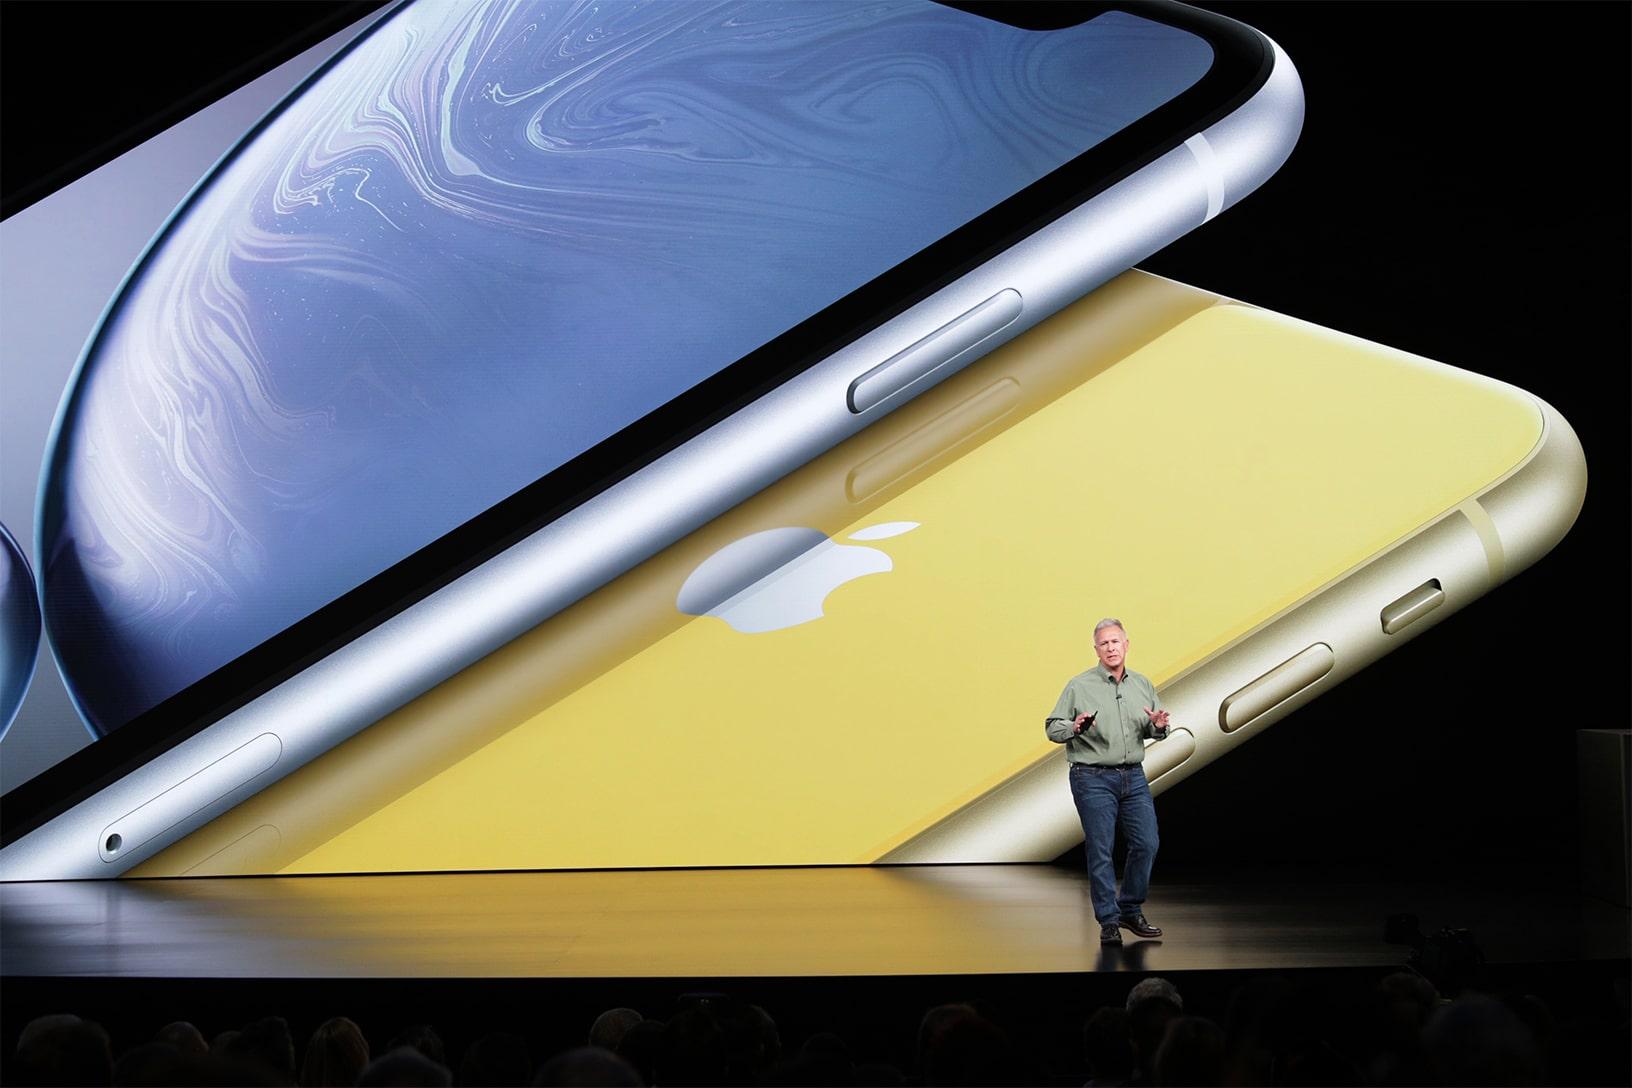 Neues bestes iphone